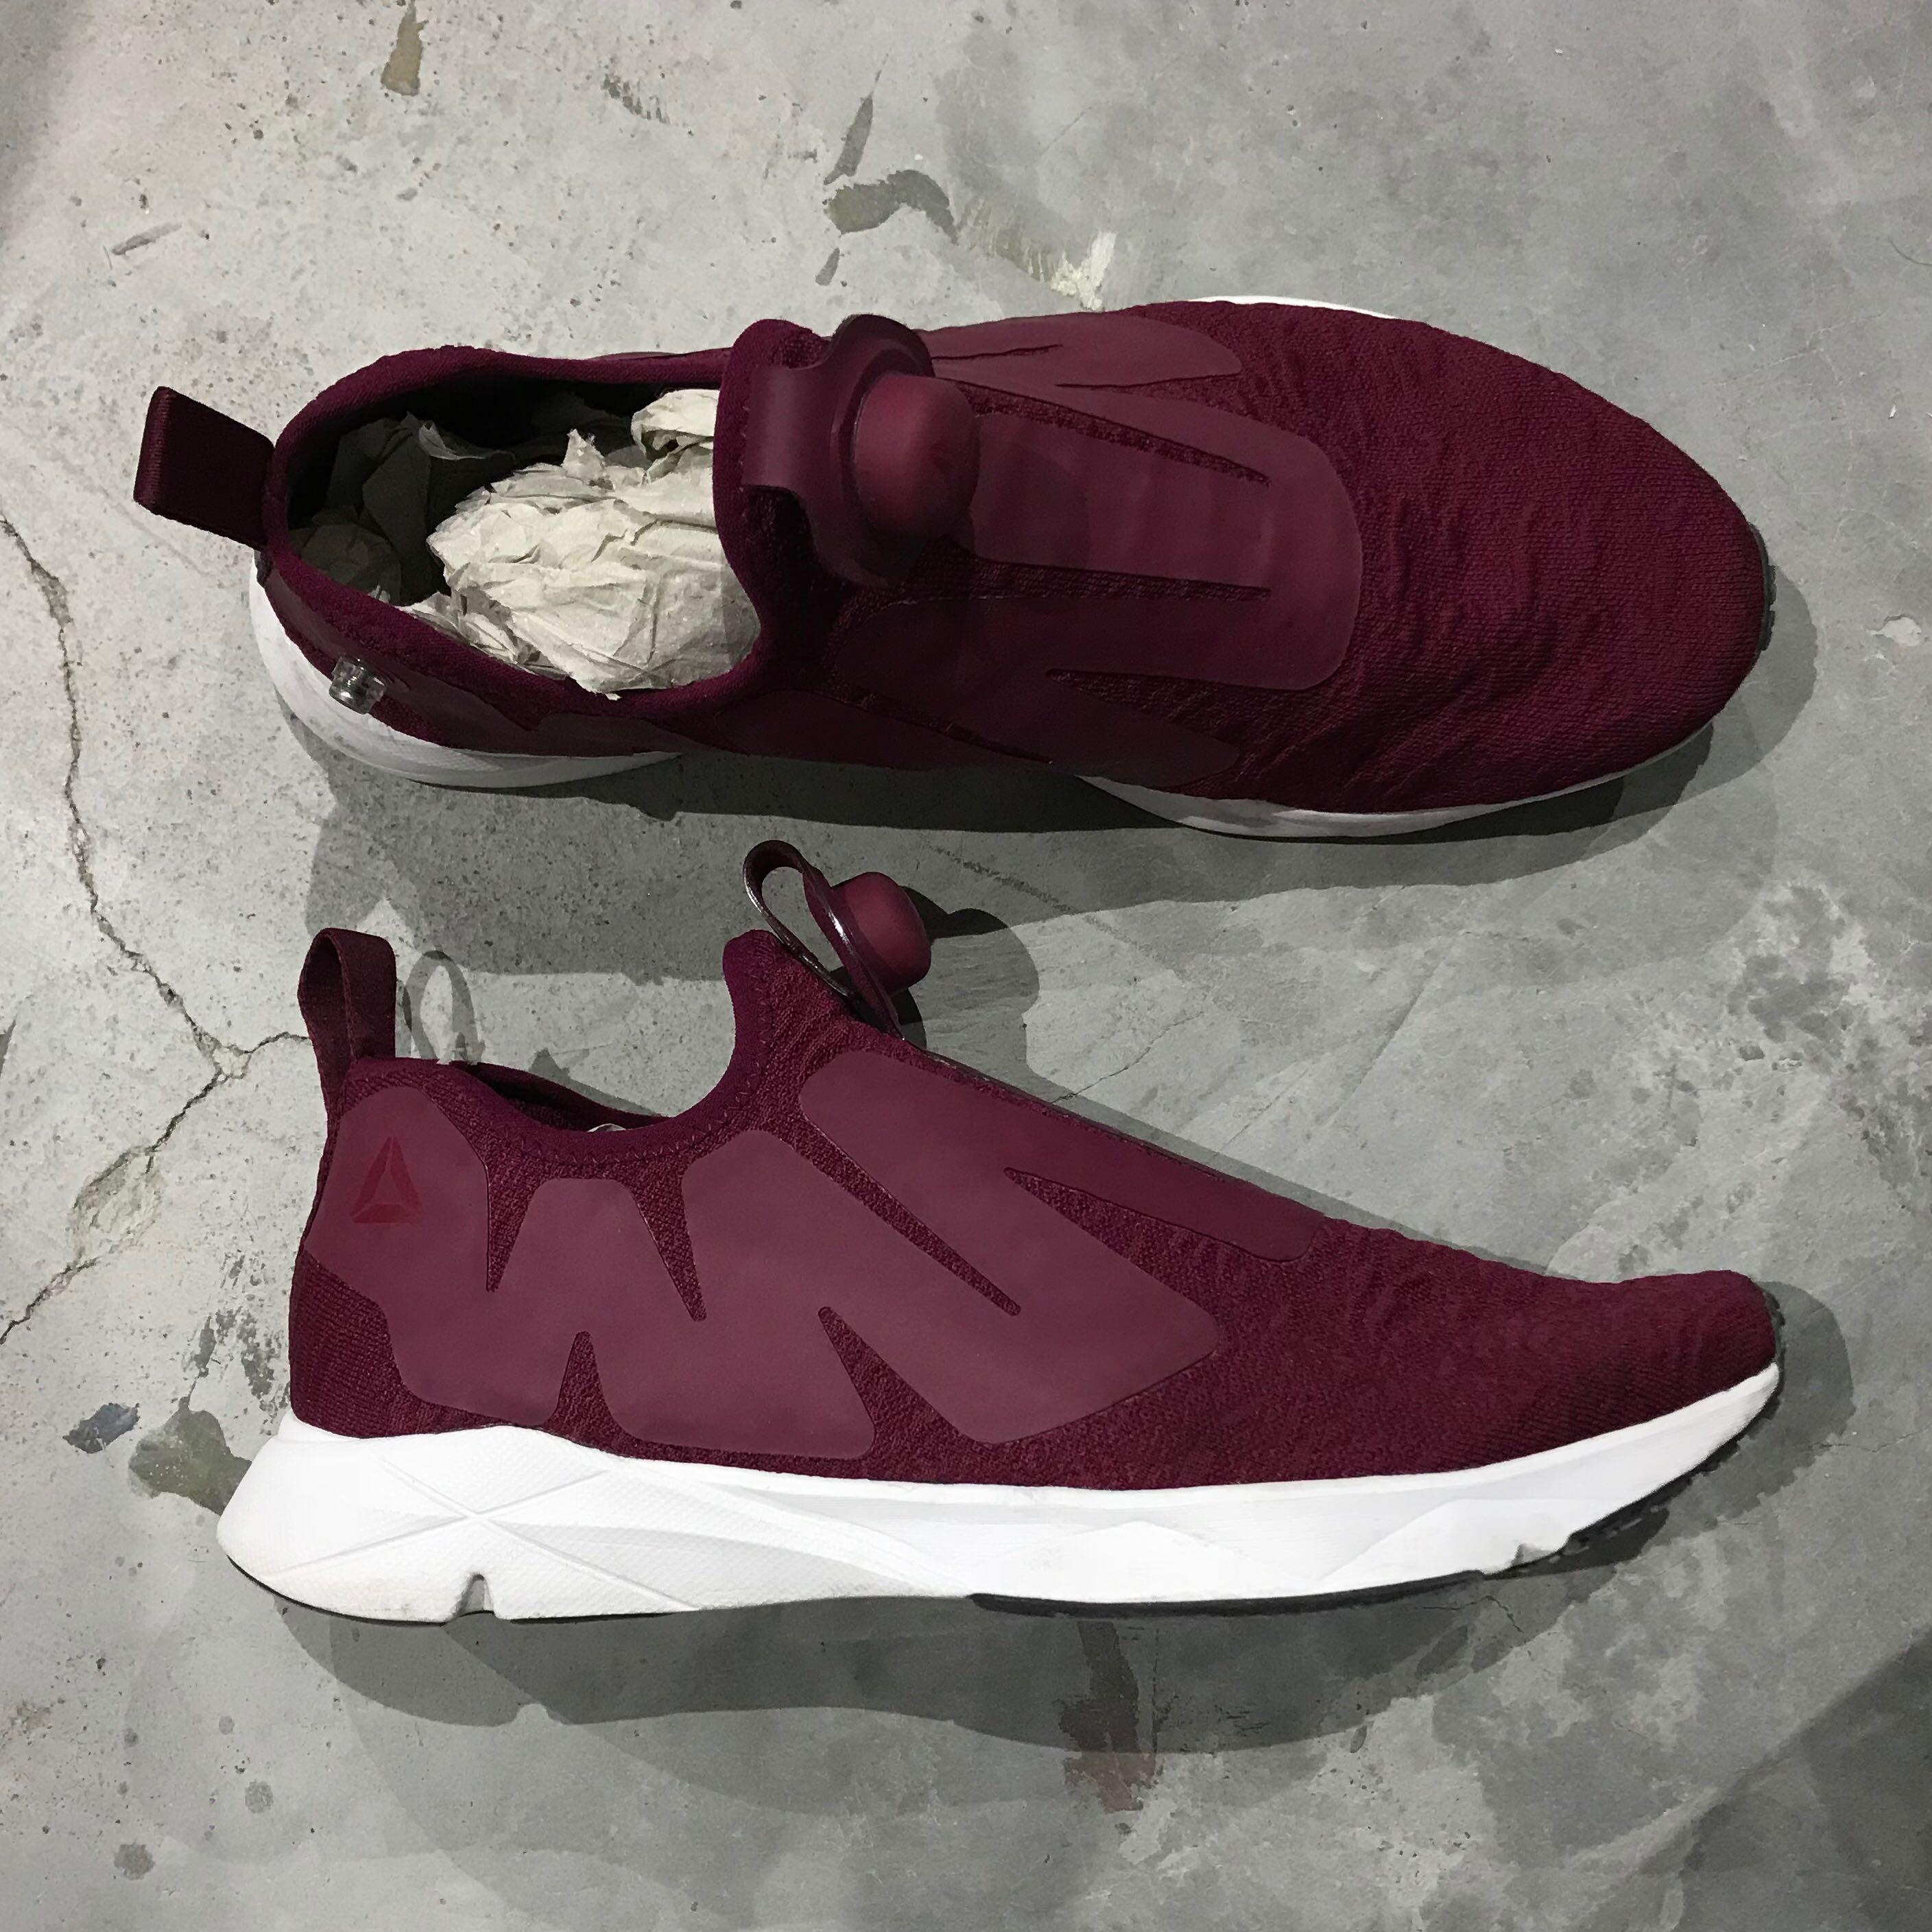 fdce2d12227407 Reebok Pump Supreme Flexweave Lifestyle Sneakers